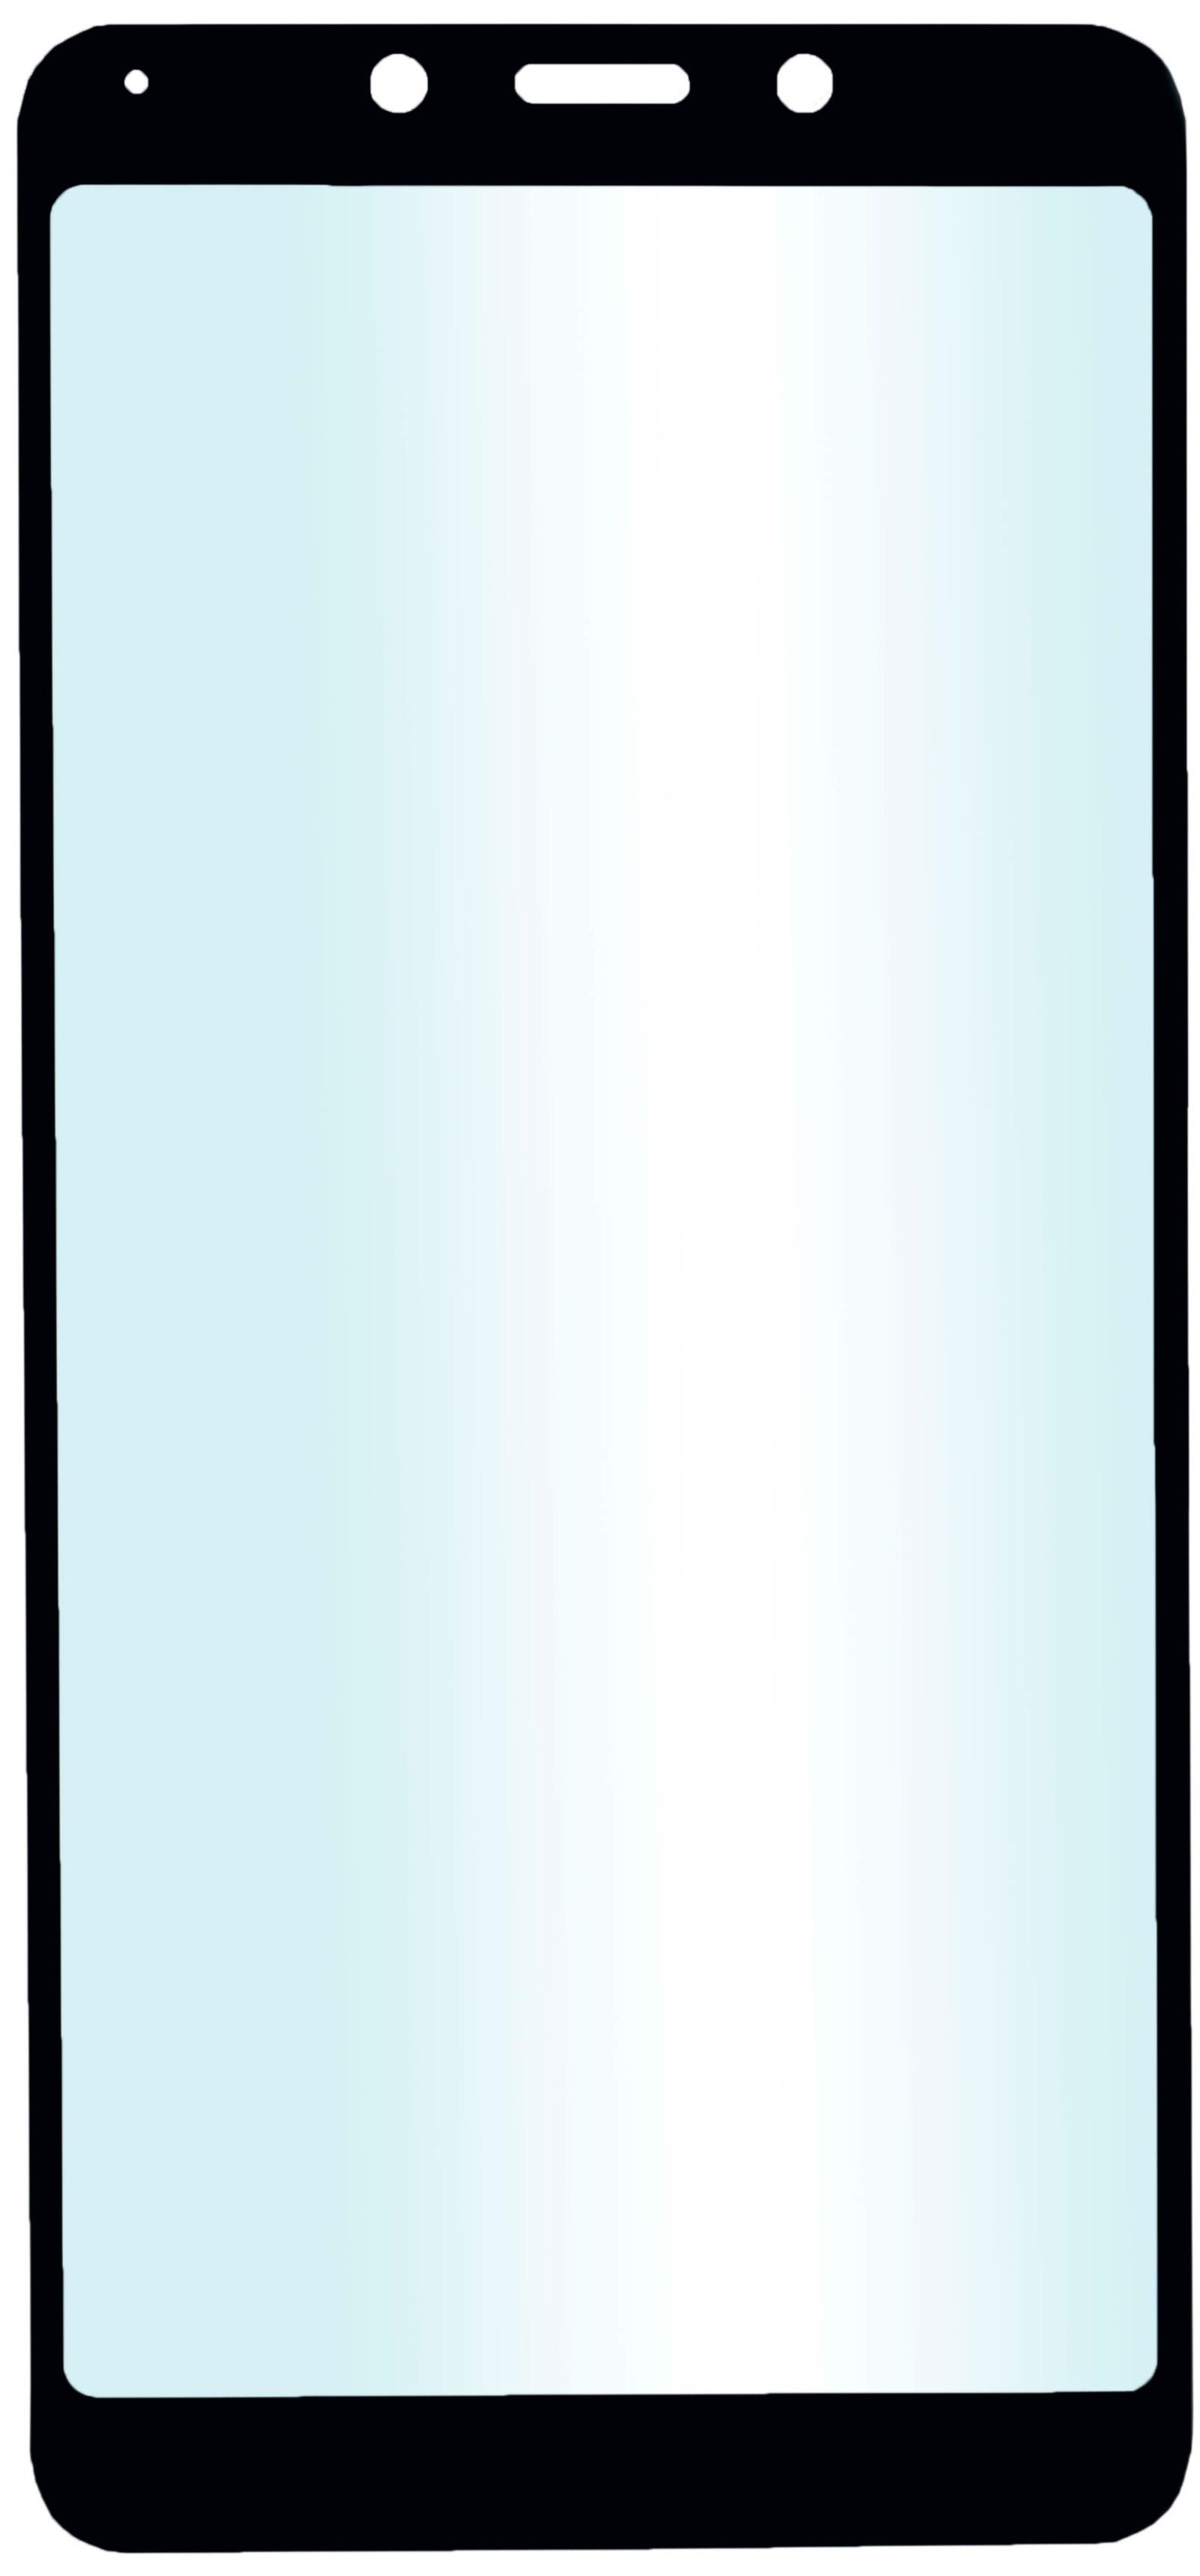 Защитное стекло skinBOX 1 side full screen, 4660041405446, черный защитное стекло skinbox full screen 4630042522817 черный